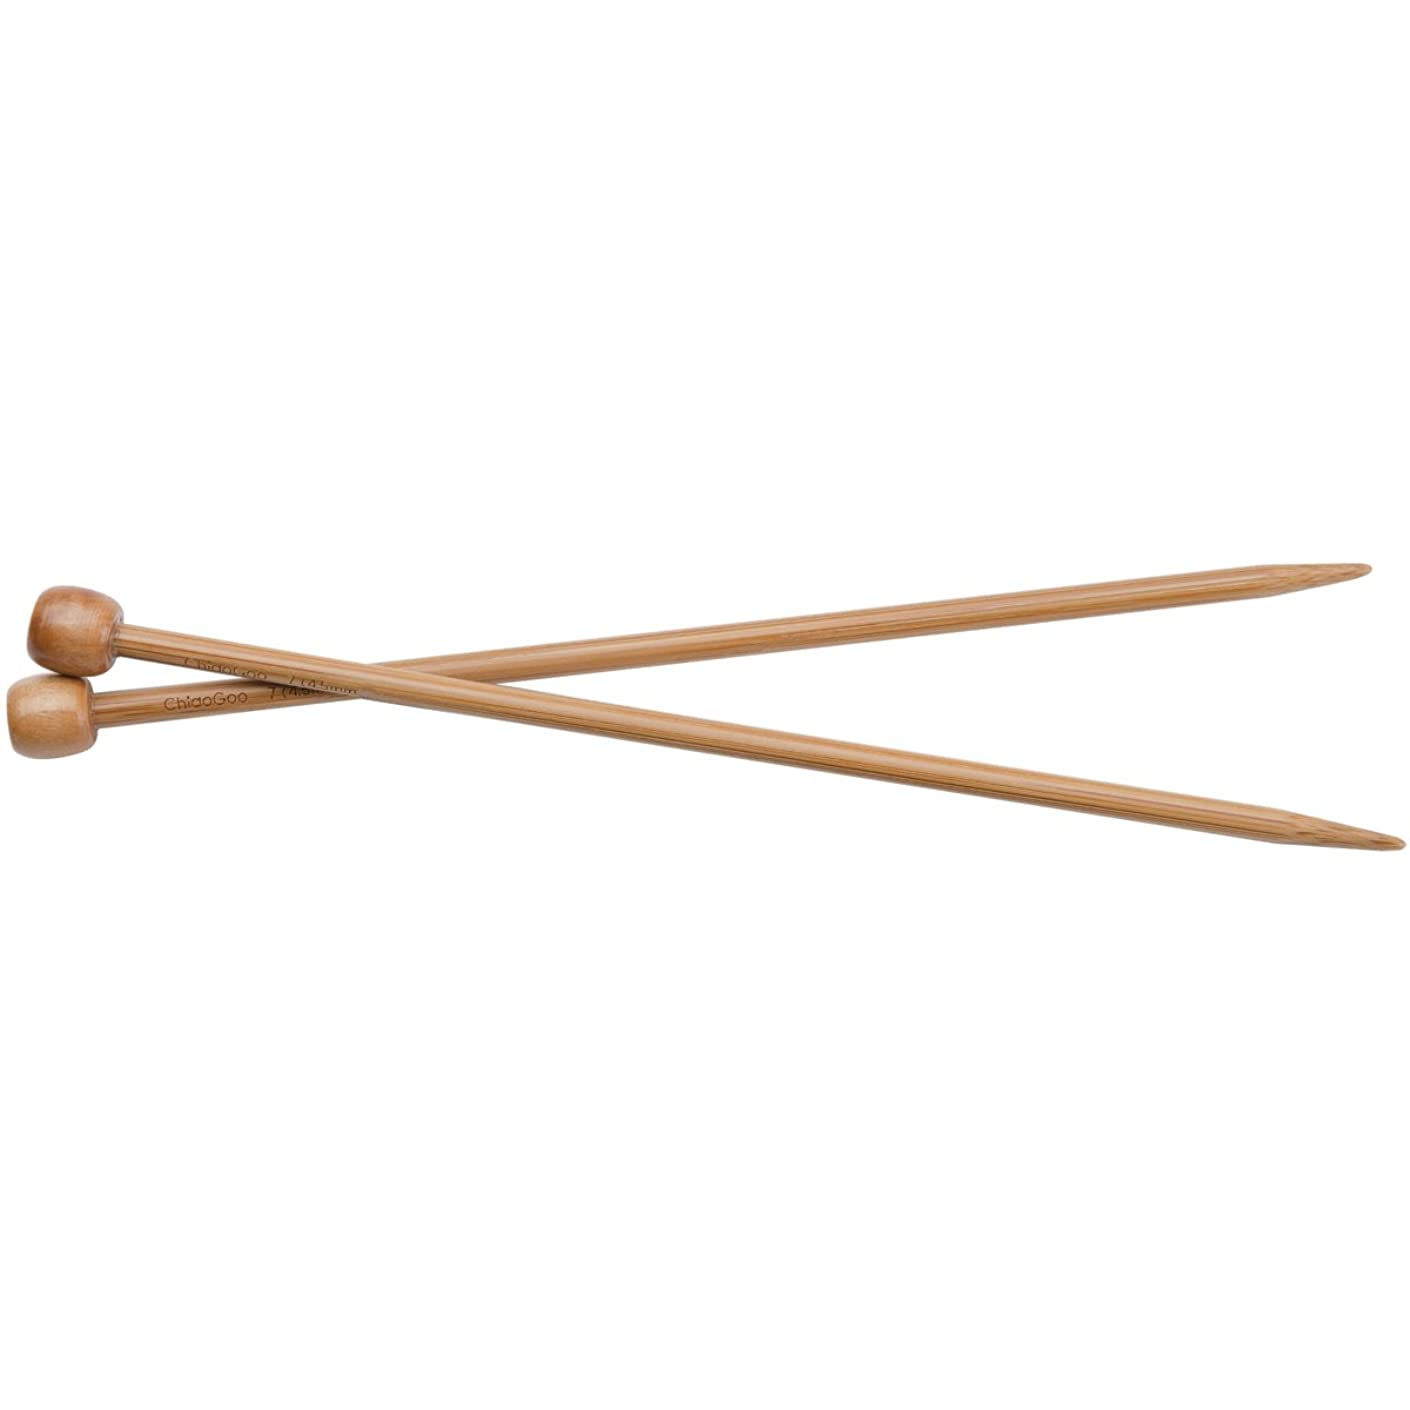 ChiaoGoo 7-Inch Single Point Dark Patina Knitting Needles, 3/3.25mm